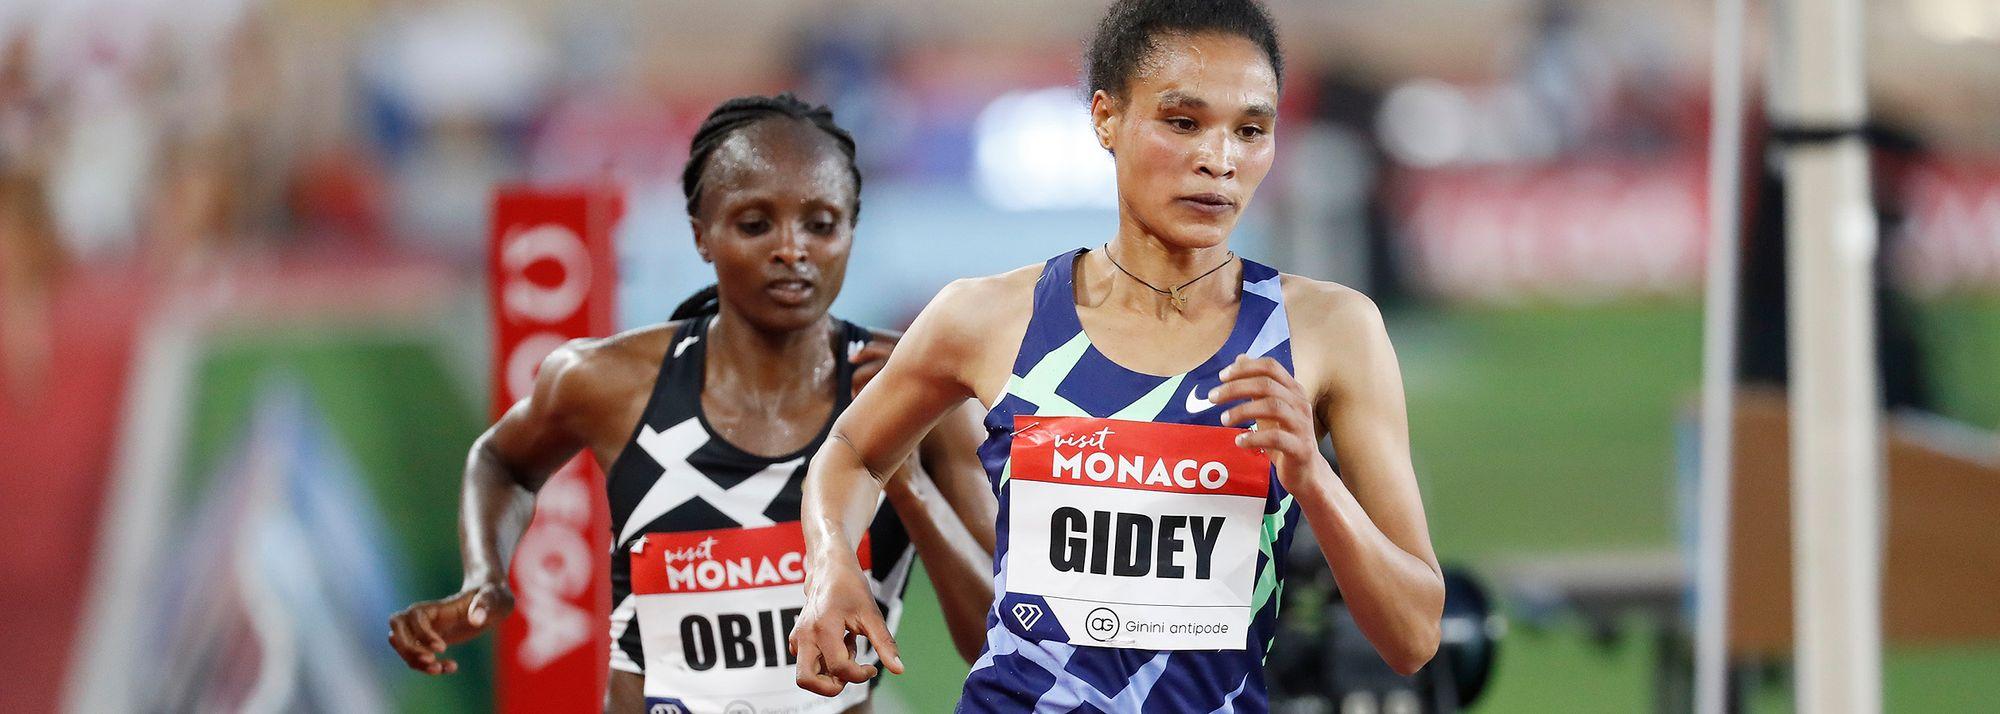 World record-holder takes on world champion